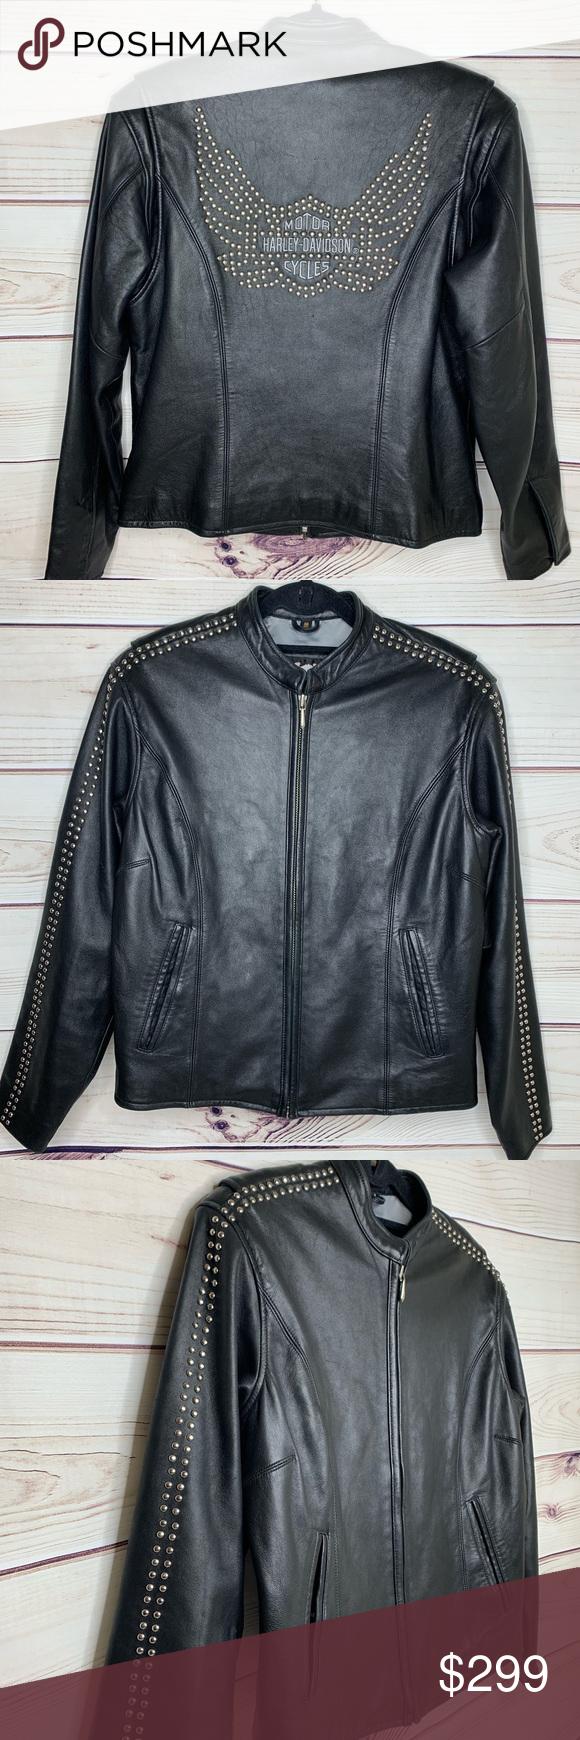 Harley Davidson Studded Leather Jacket With Wings Studded Leather Jacket Leather Jackets Women Leather Jacket [ 1740 x 580 Pixel ]